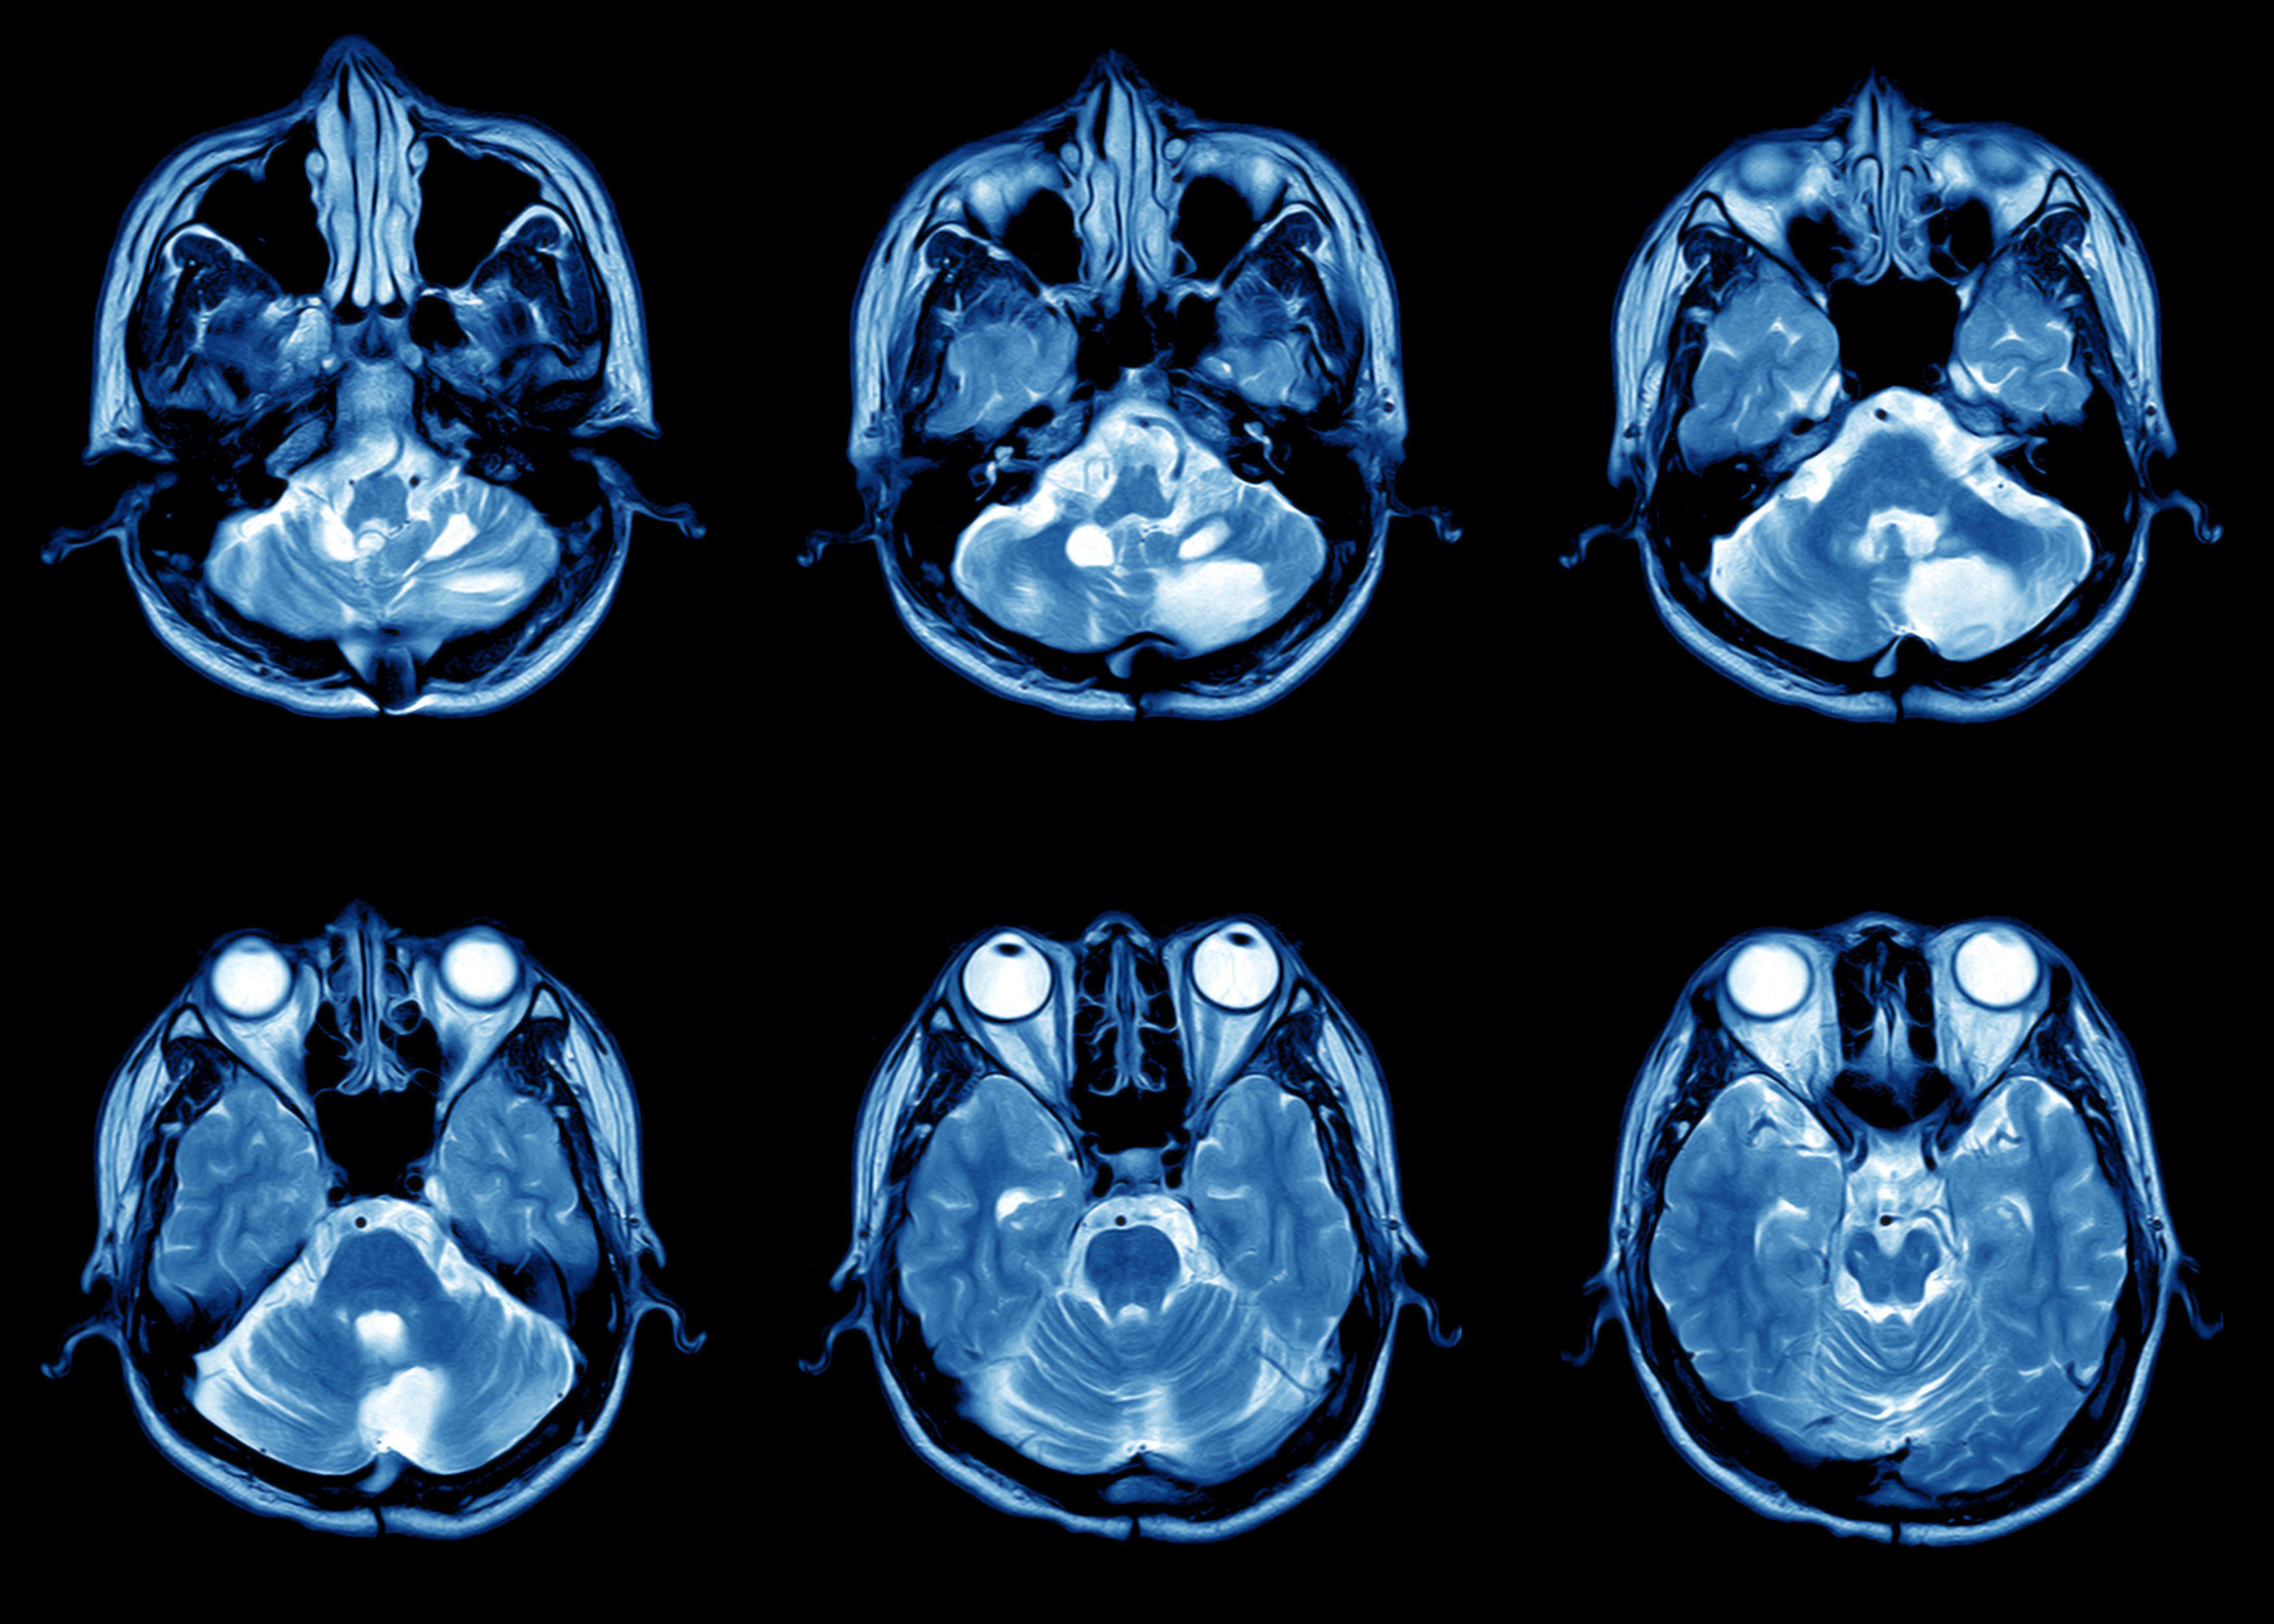 Image of brain MRI scan